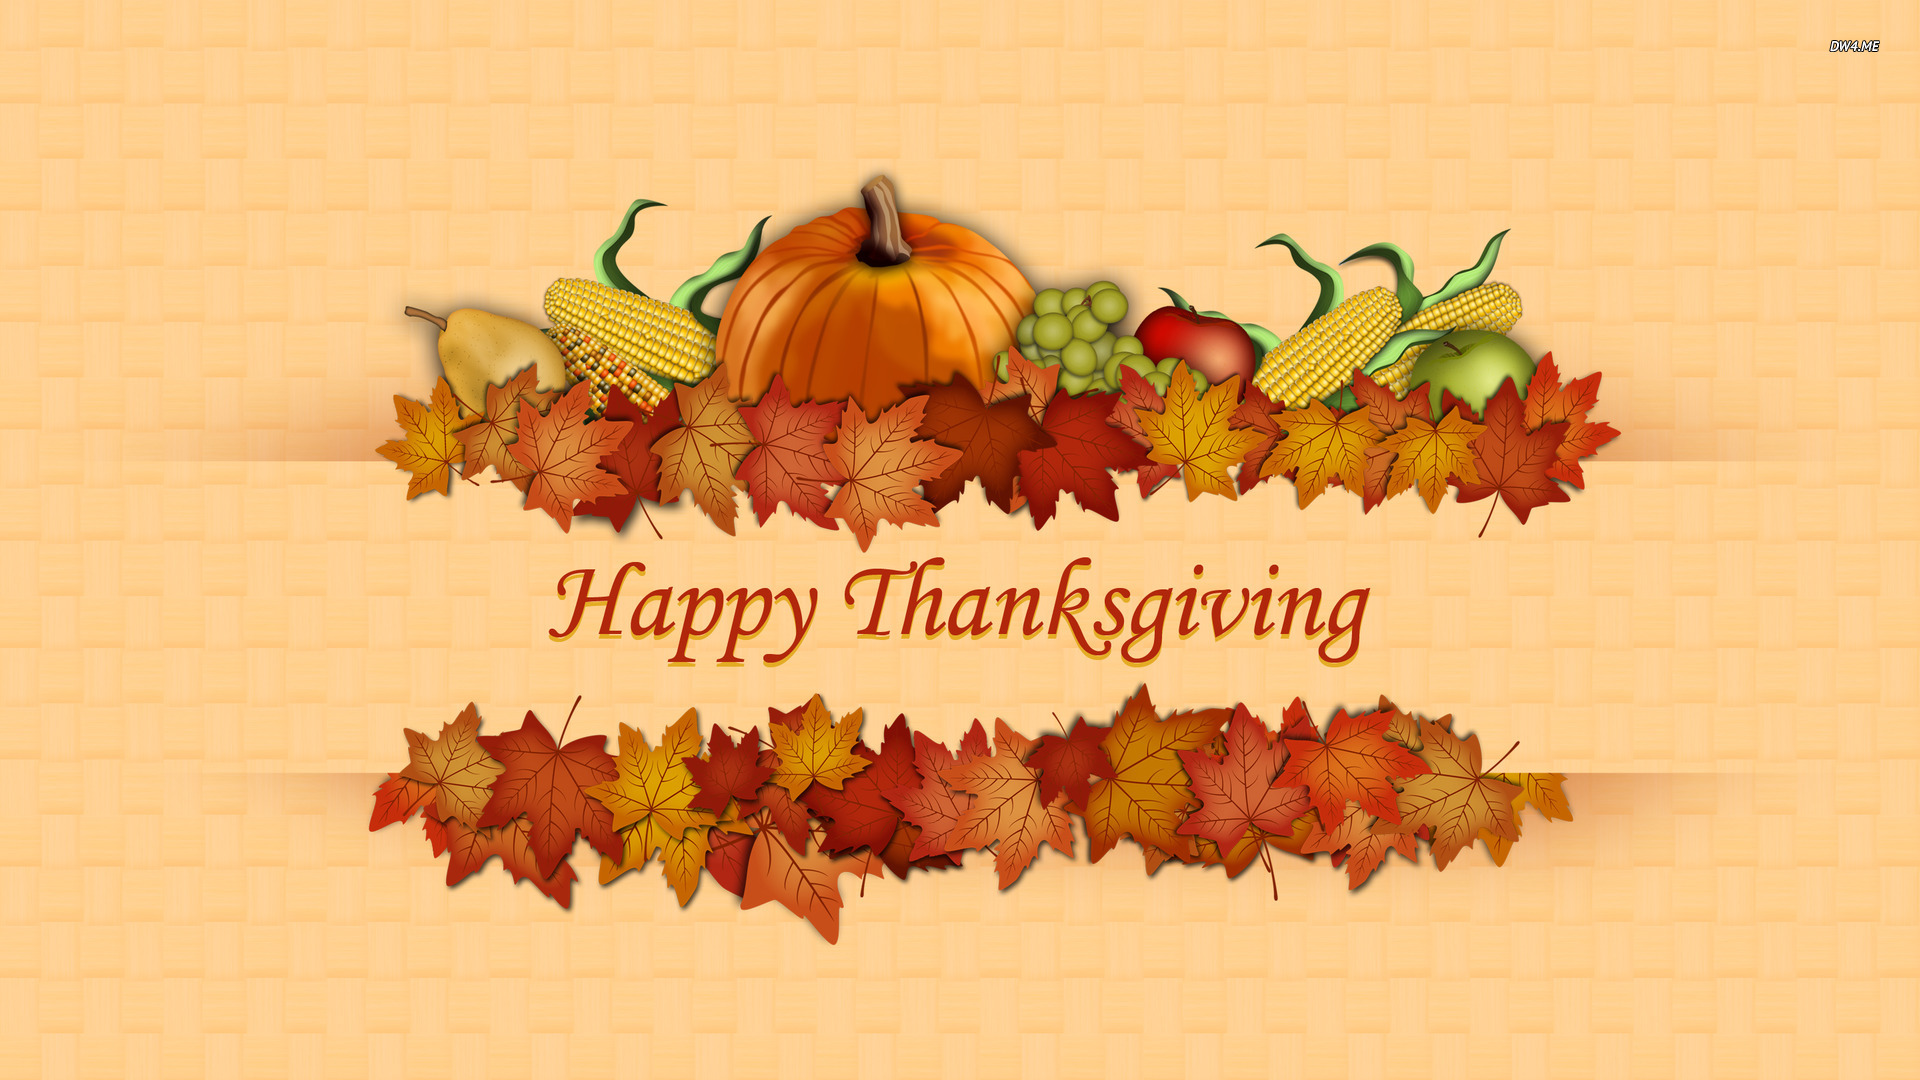 Beautifull Thanksgiving Wallpapers Free Download